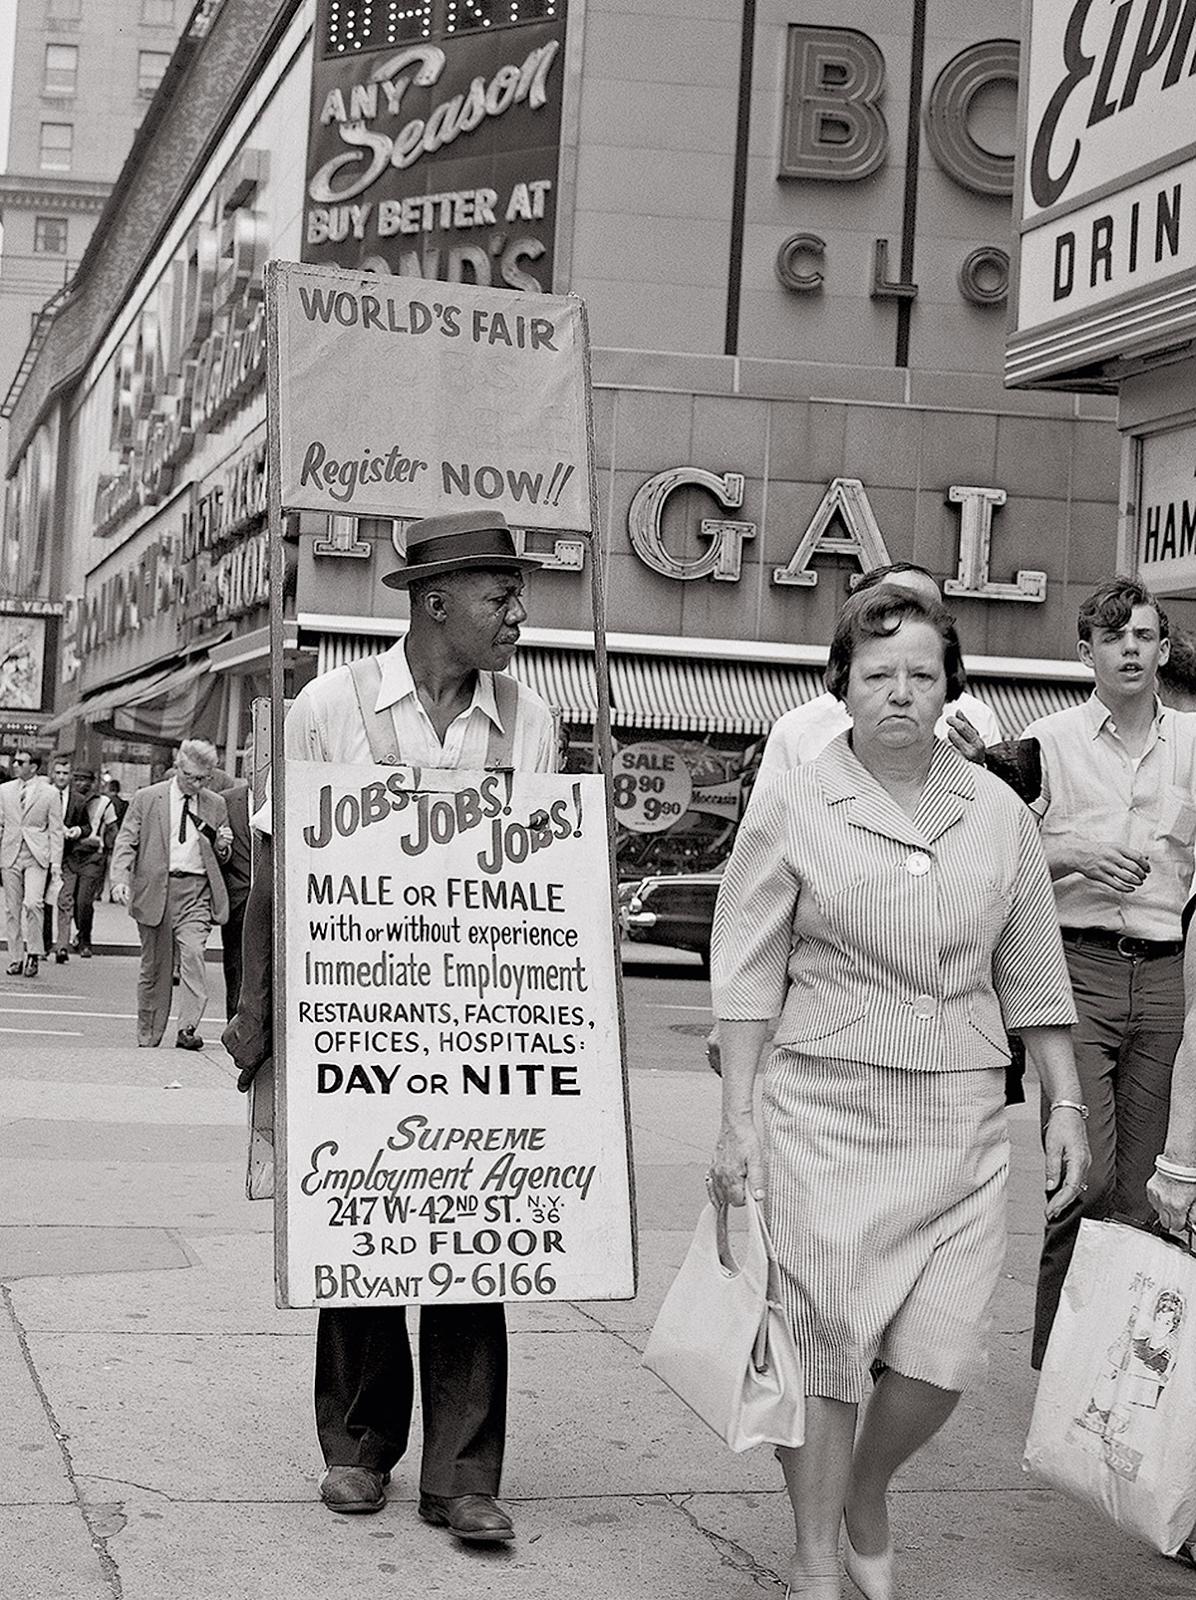 Jobs Jobs Jobs Theater District New York Ca 1960s New